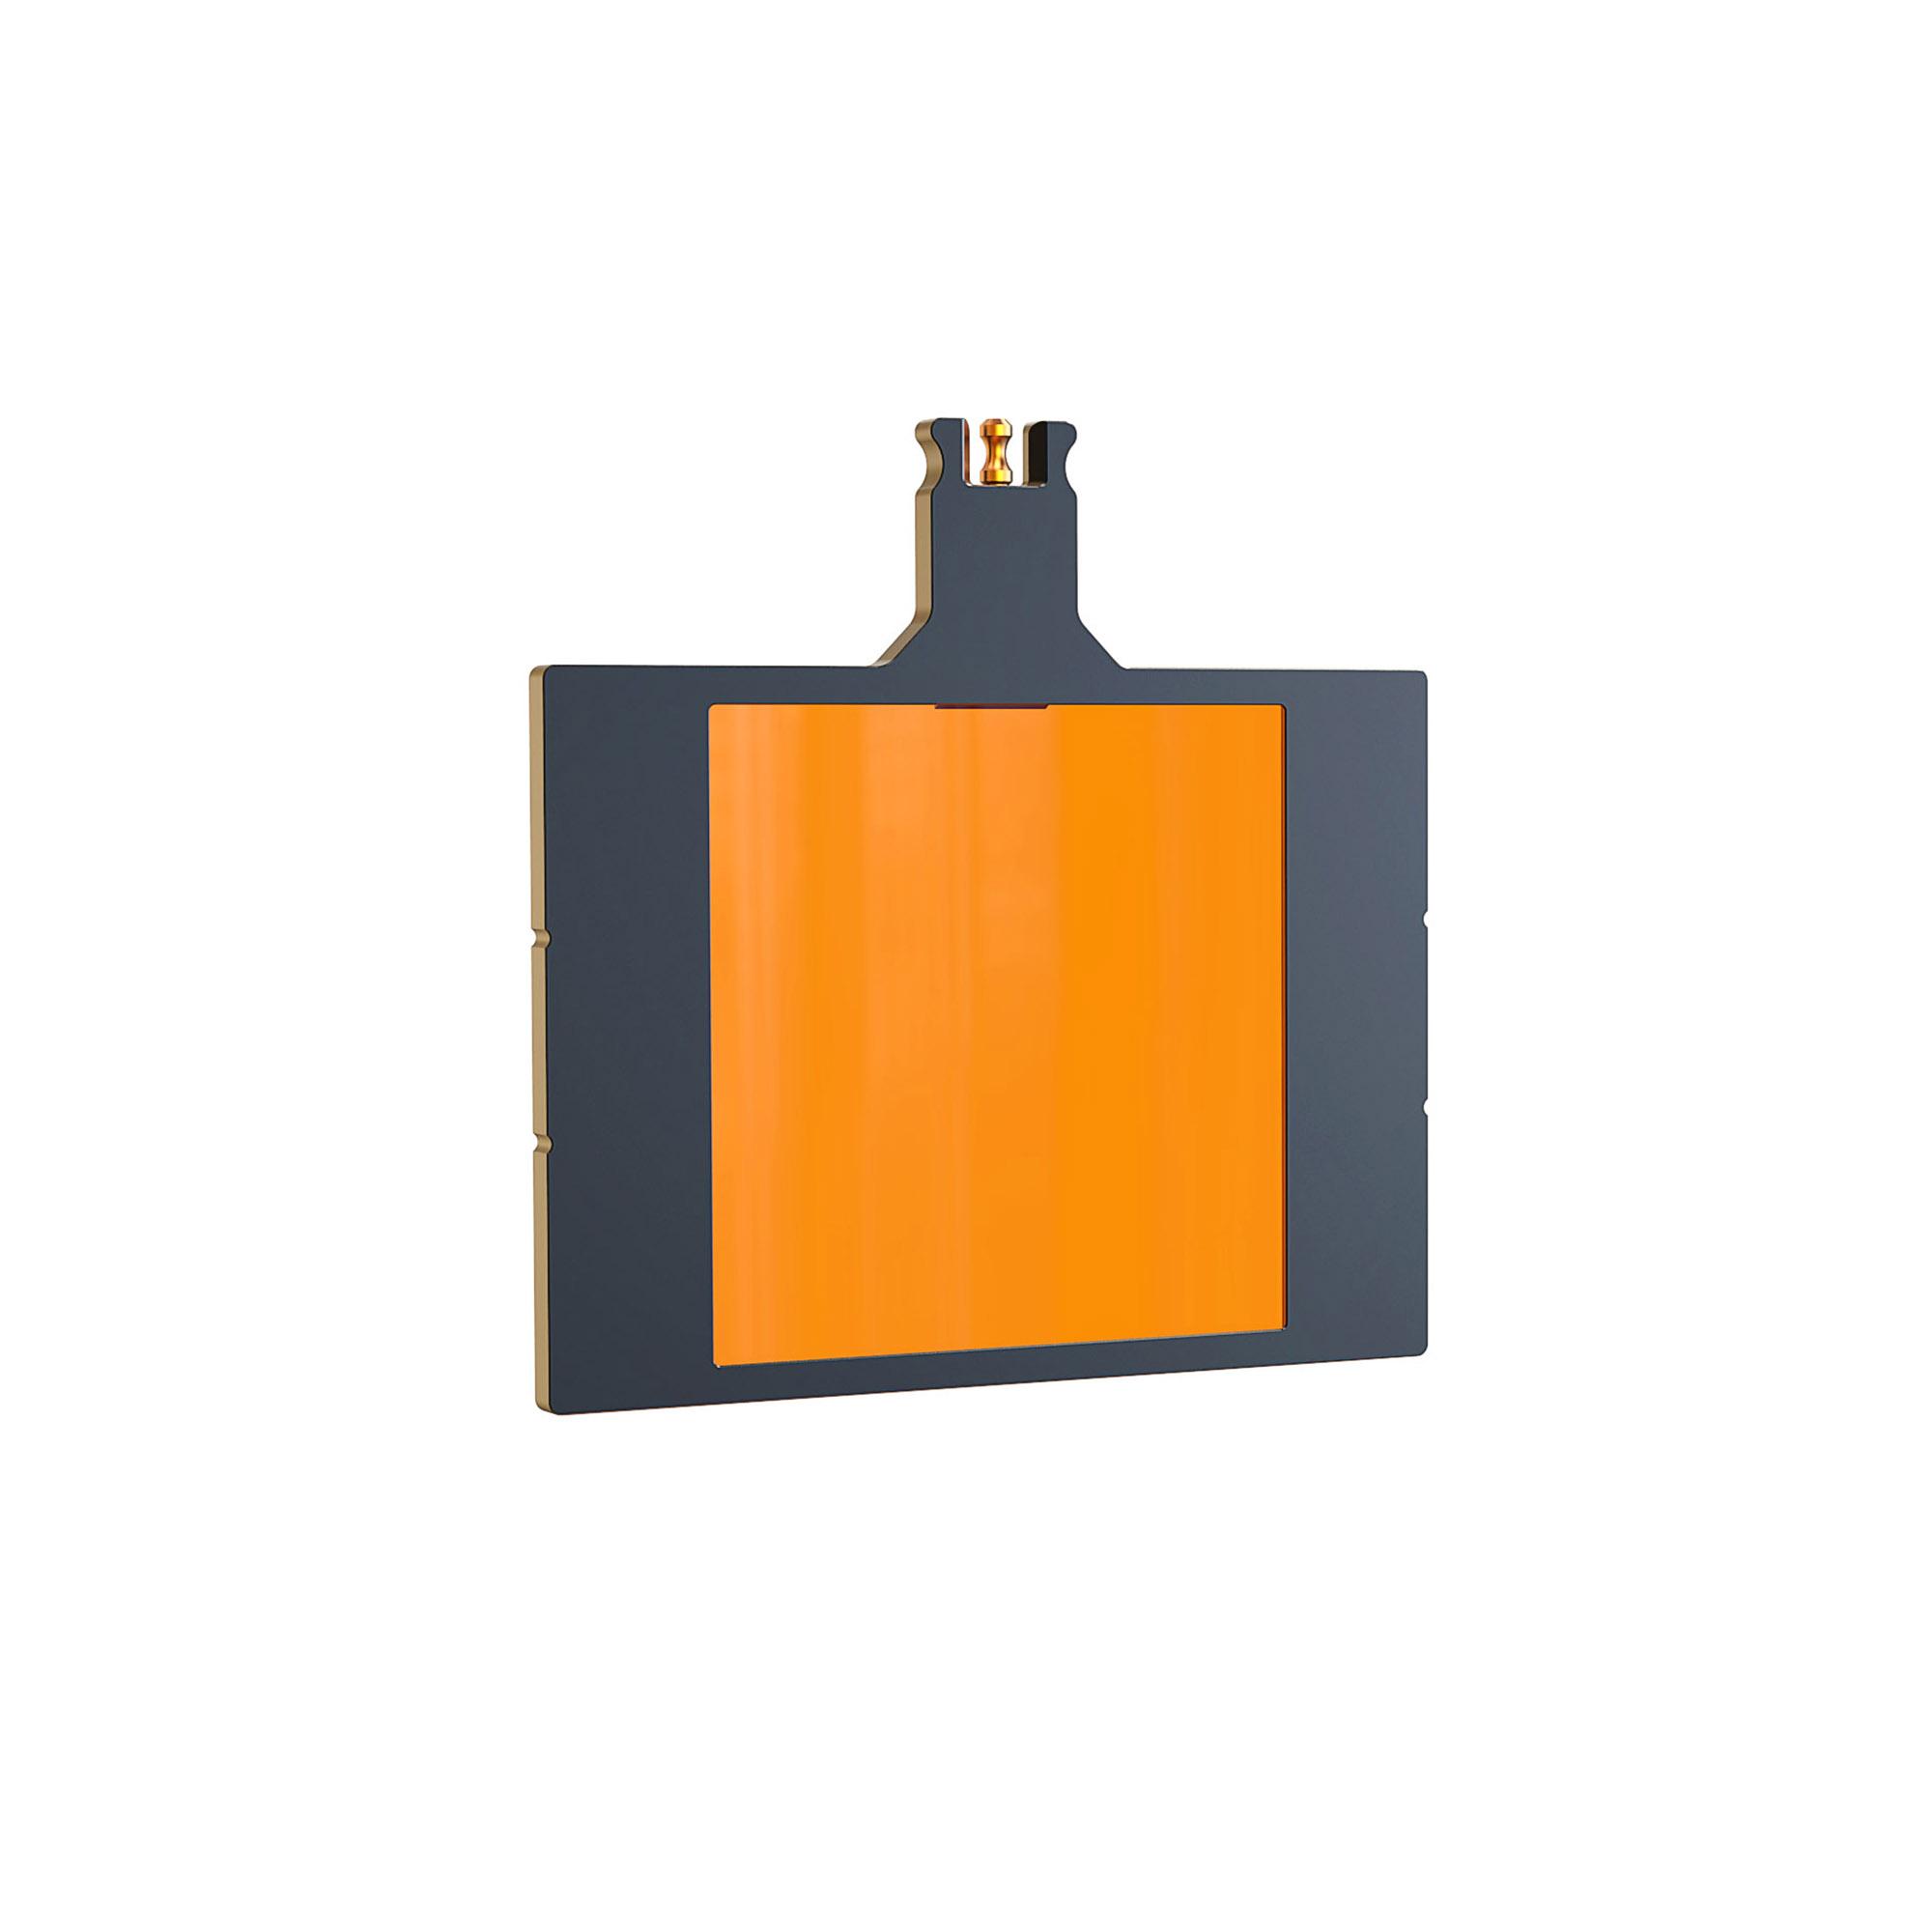 b1251.1009   viv 4 x 4   filter tray   1